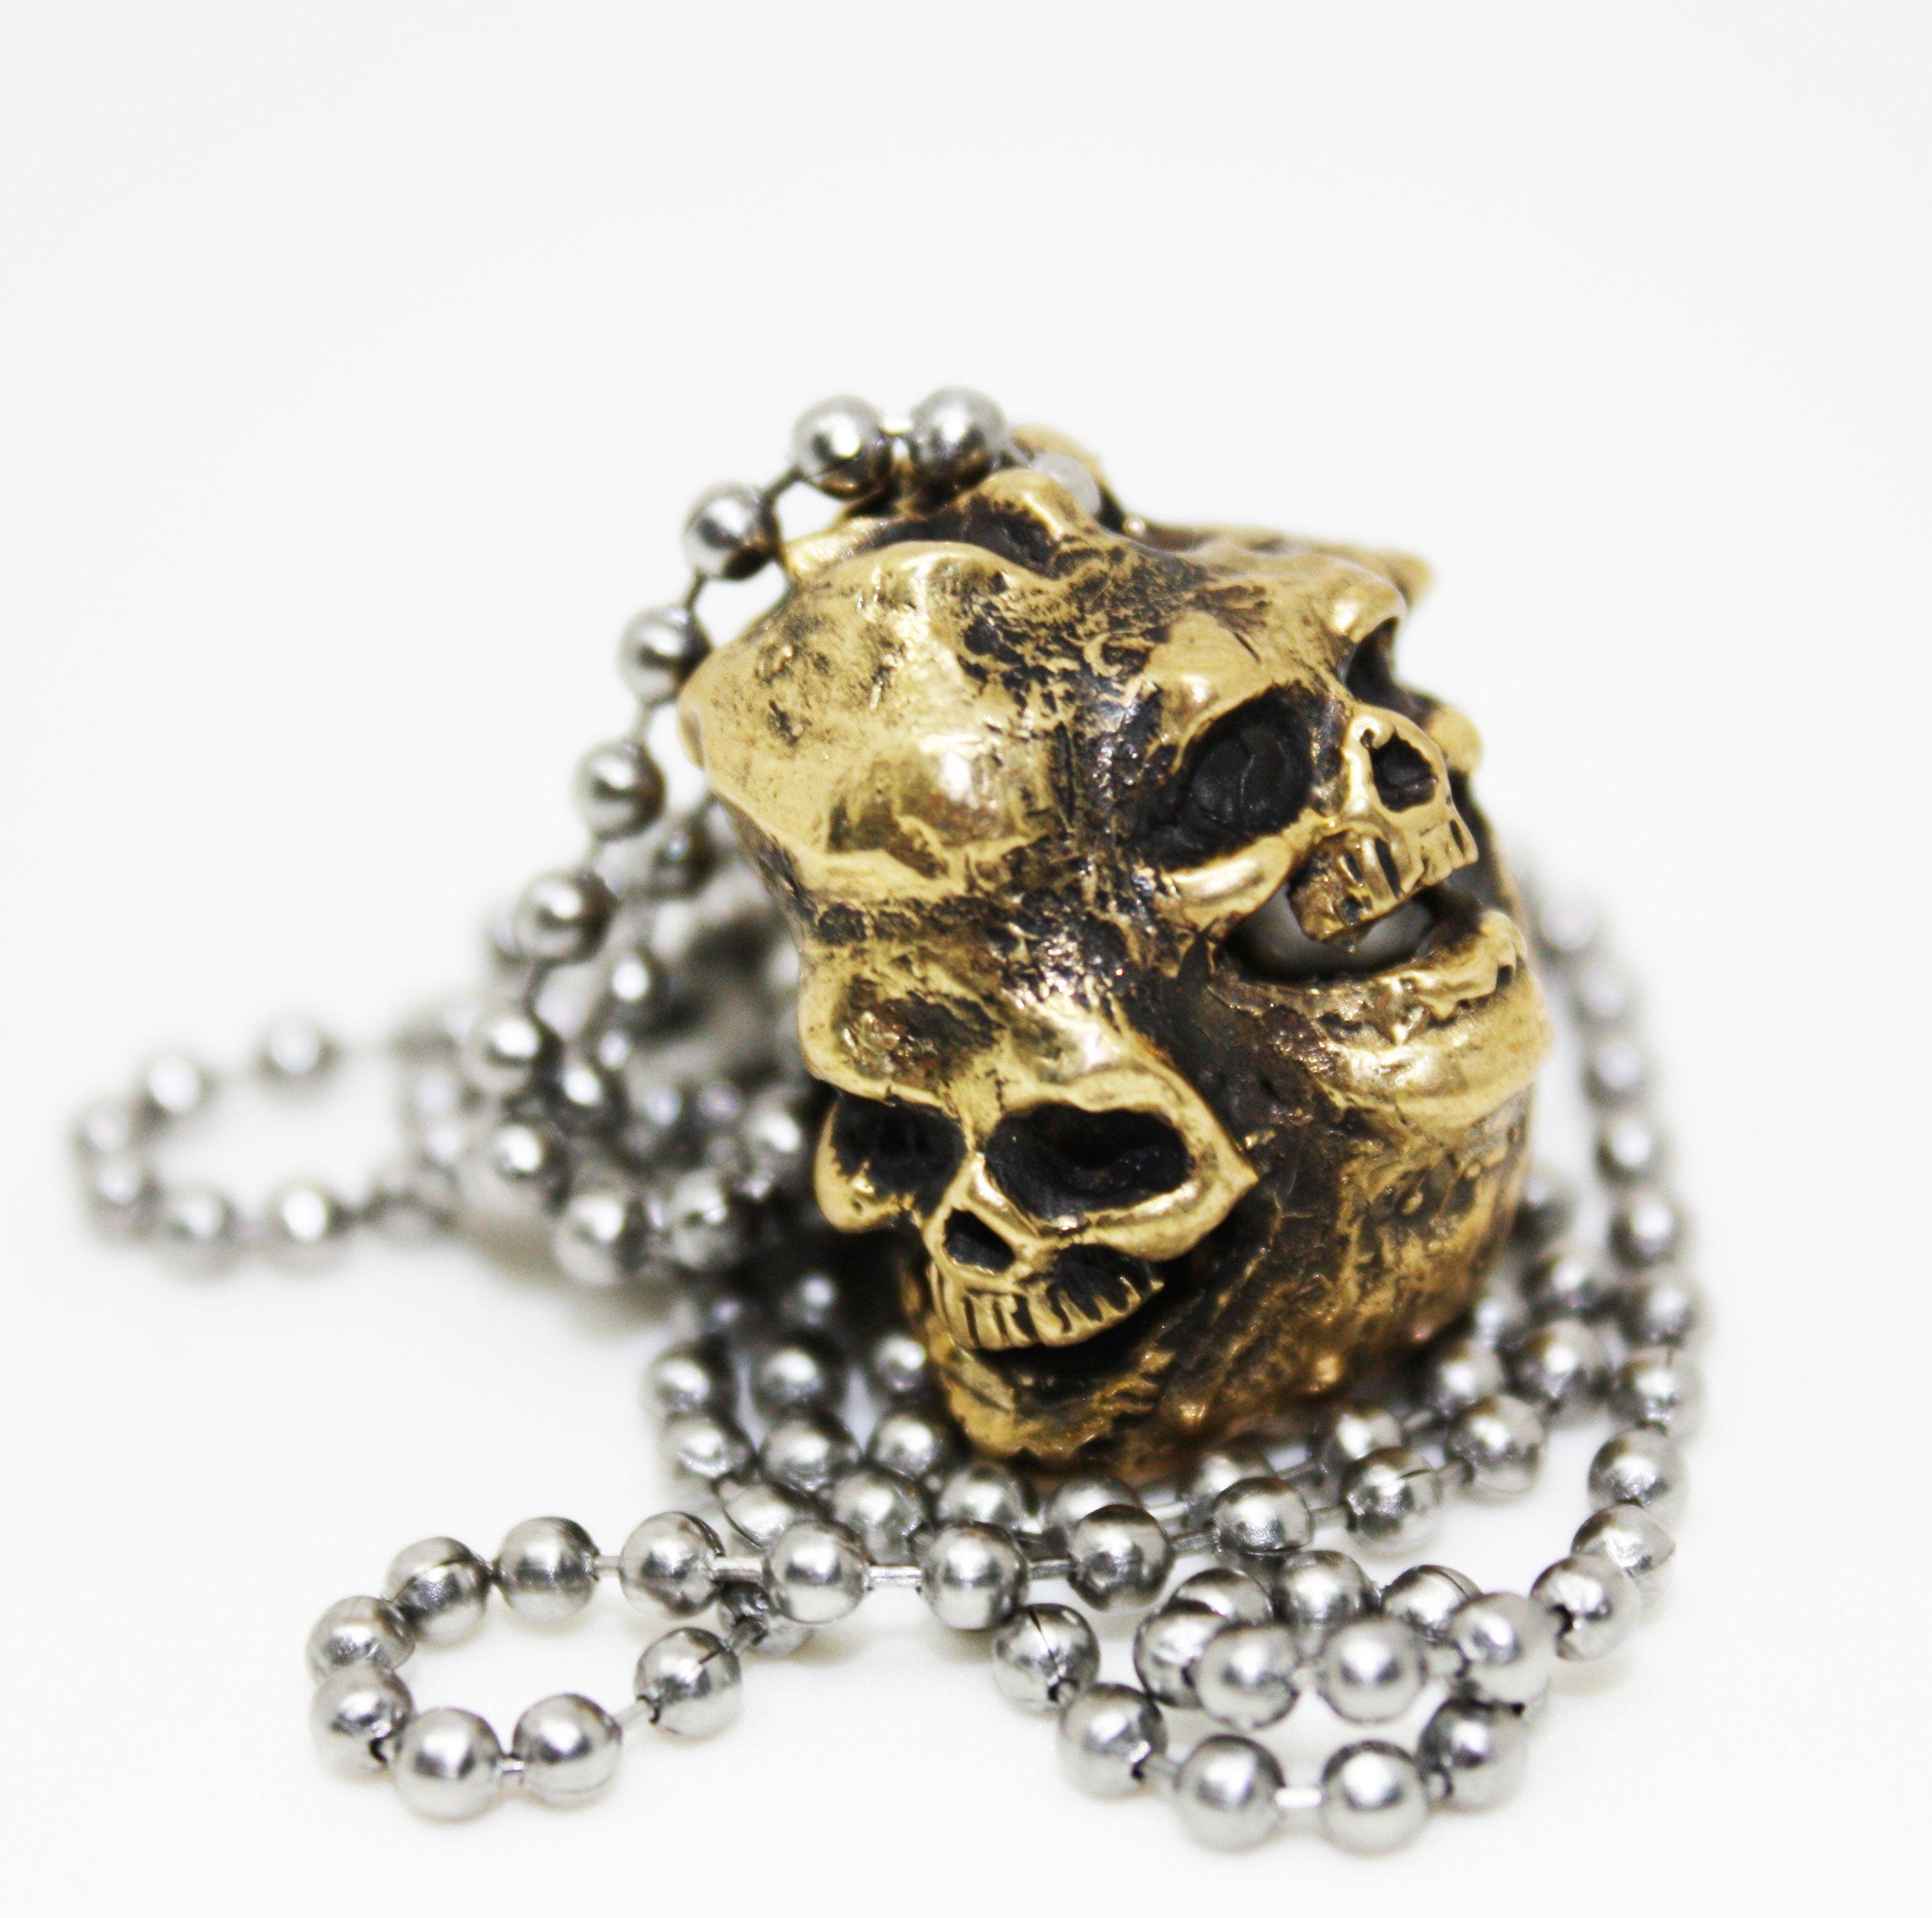 Eternal Legend Laughing Skulls - Bronze on black or silver ball chain MSRP $75